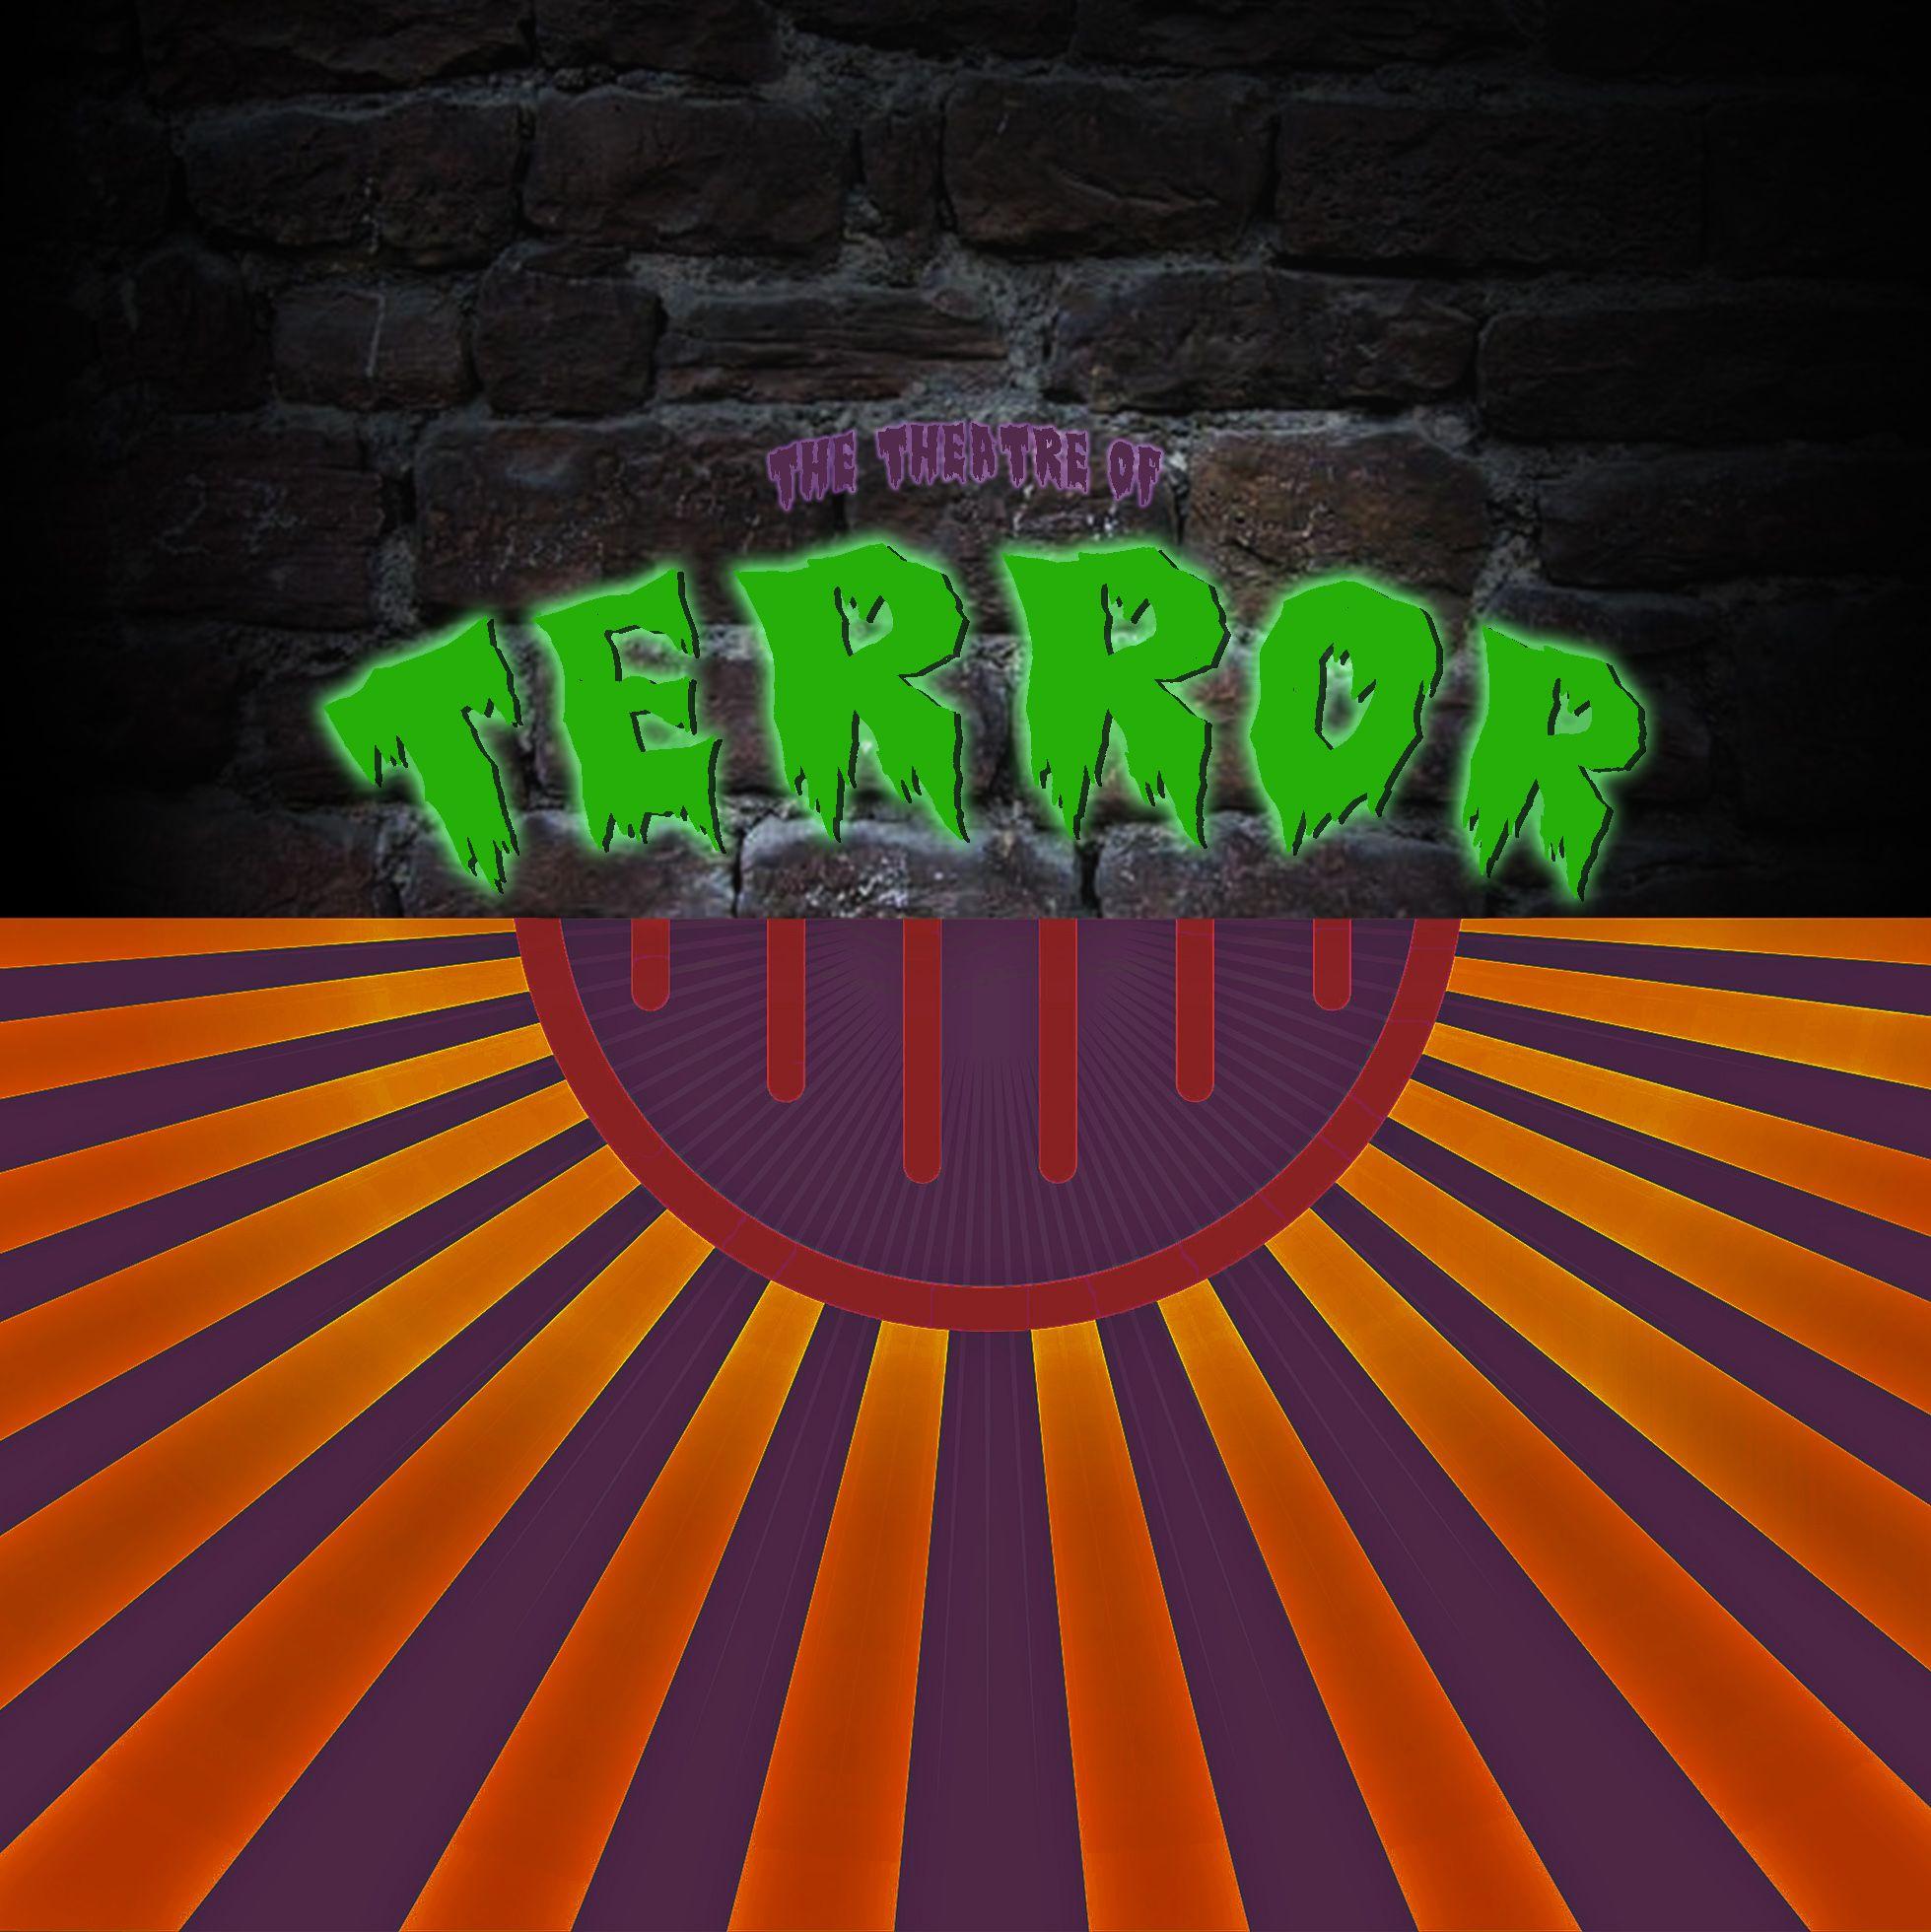 The Theatre of Terror 3 - Boo Wop! I